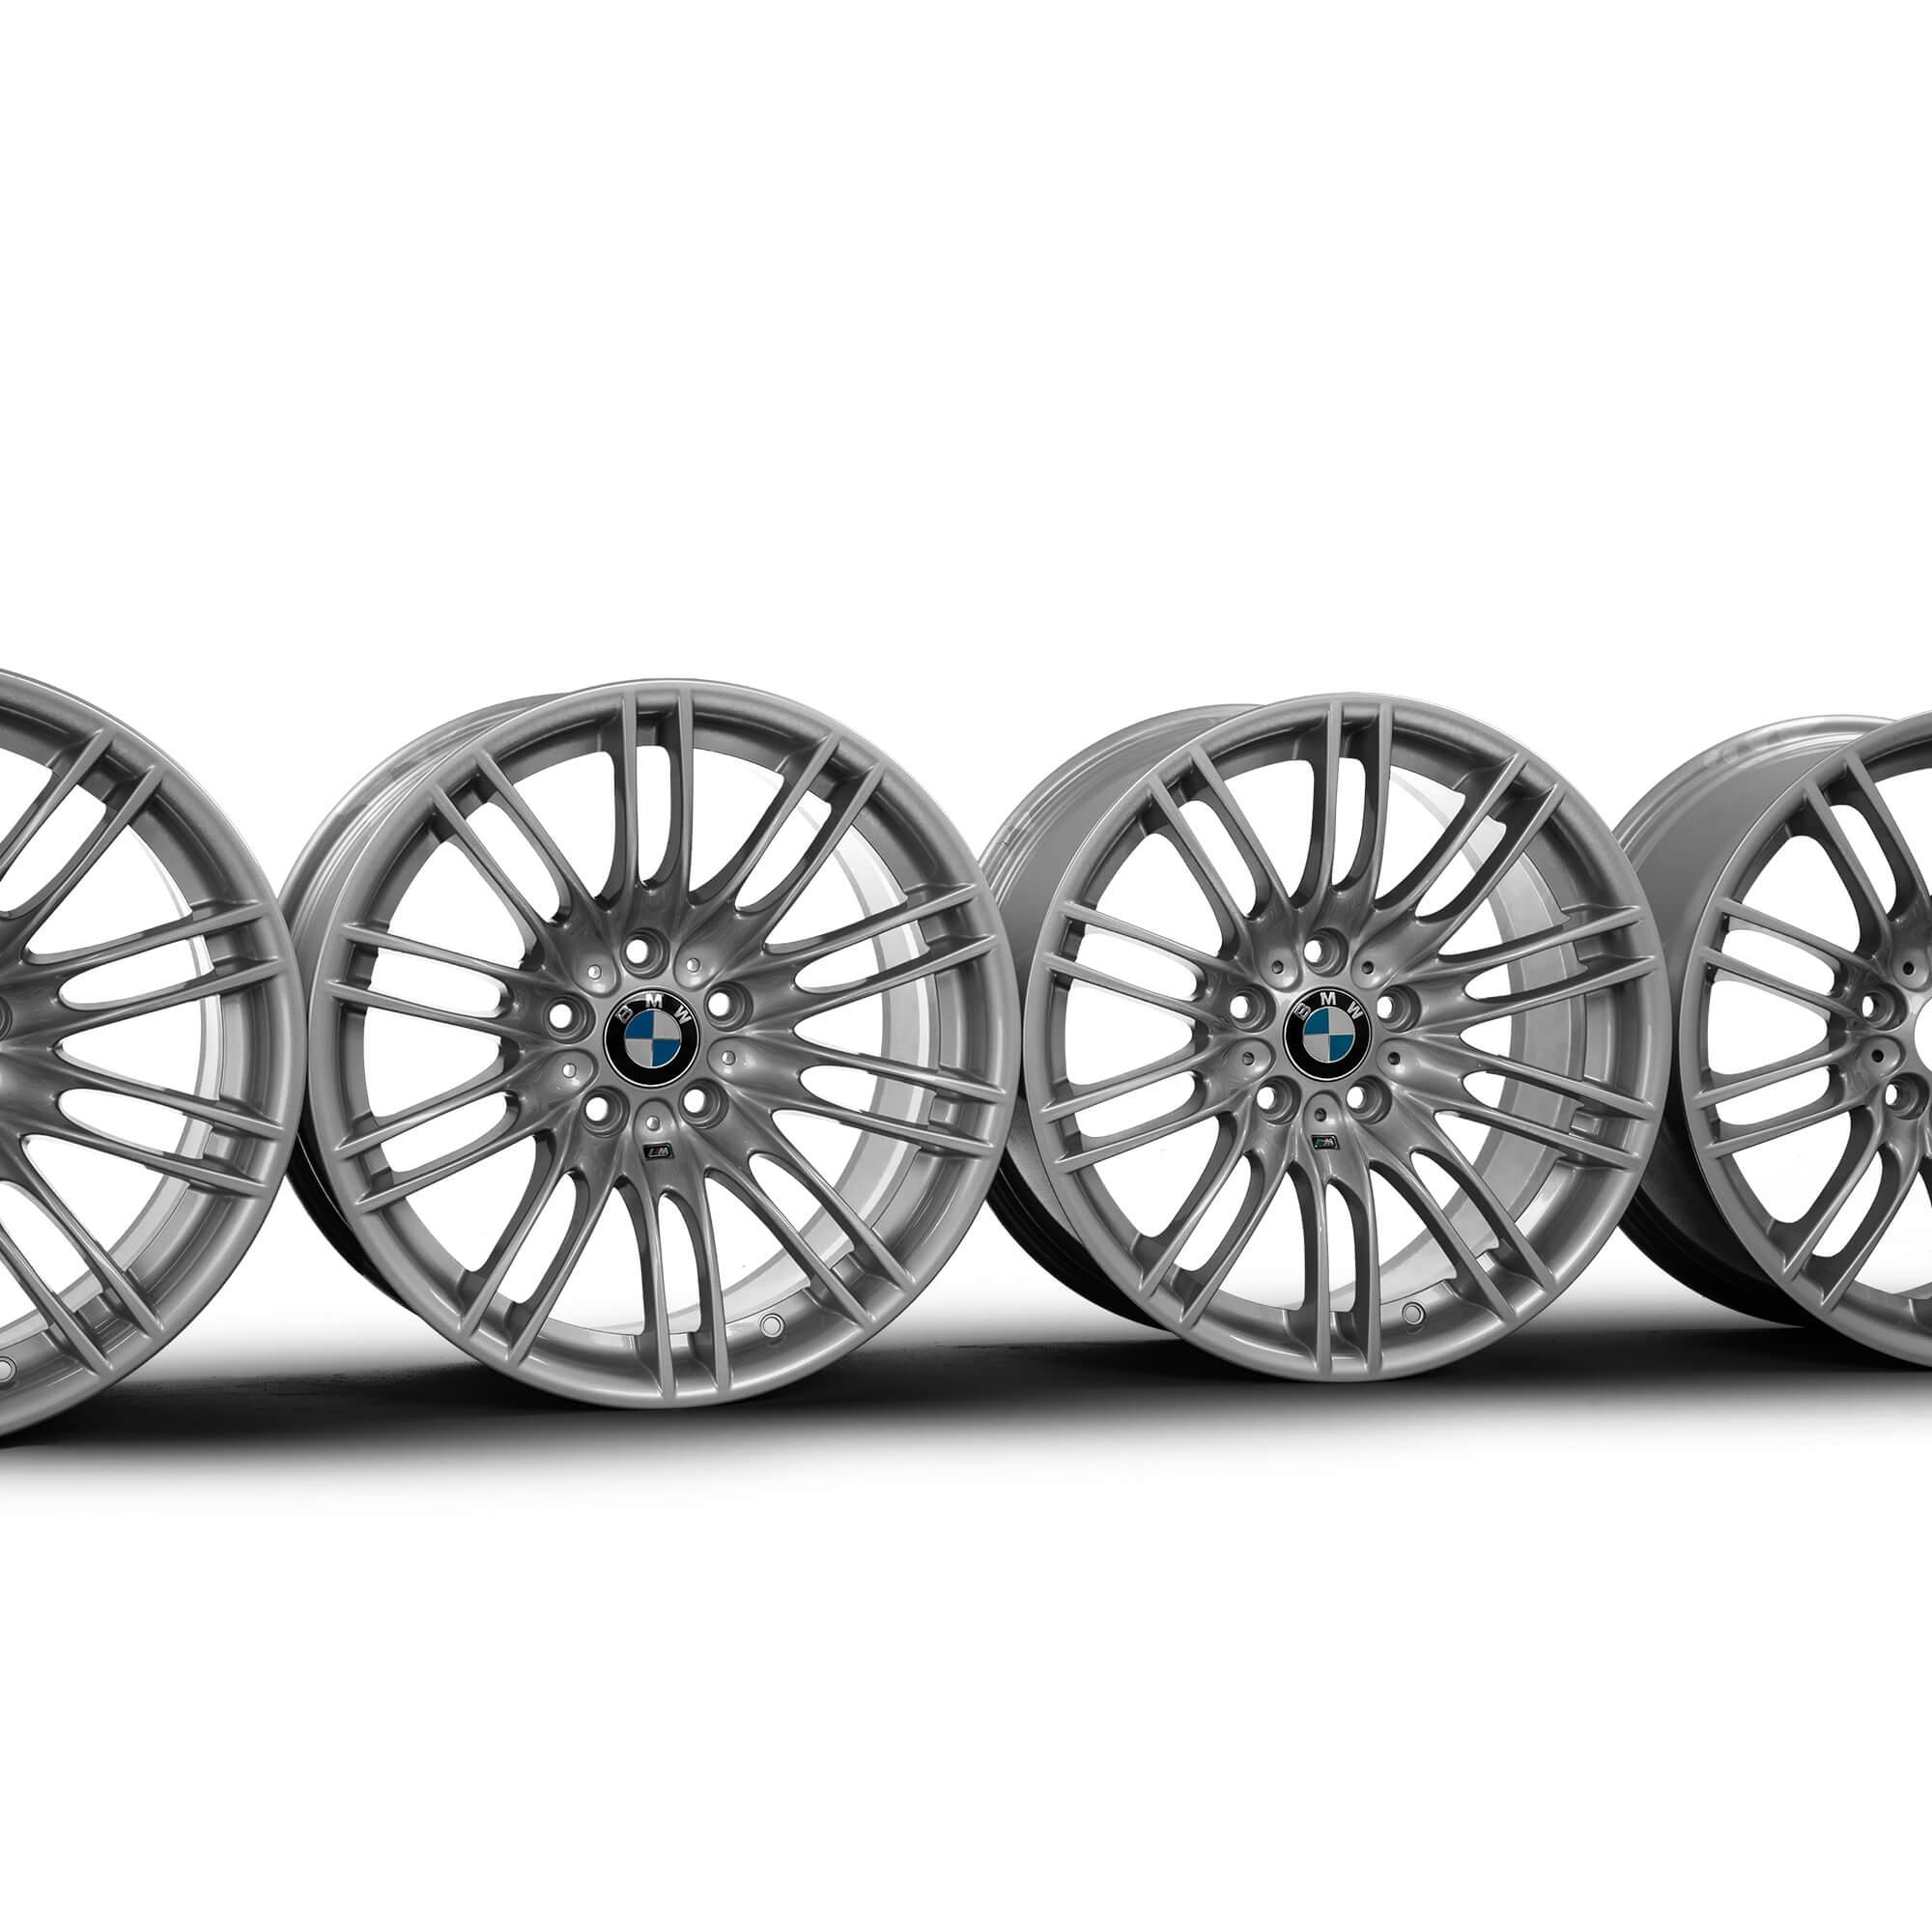 4x Bmw 18 Inch Rims 3er E90 E92 E93 Styling M260 2284504 2284505